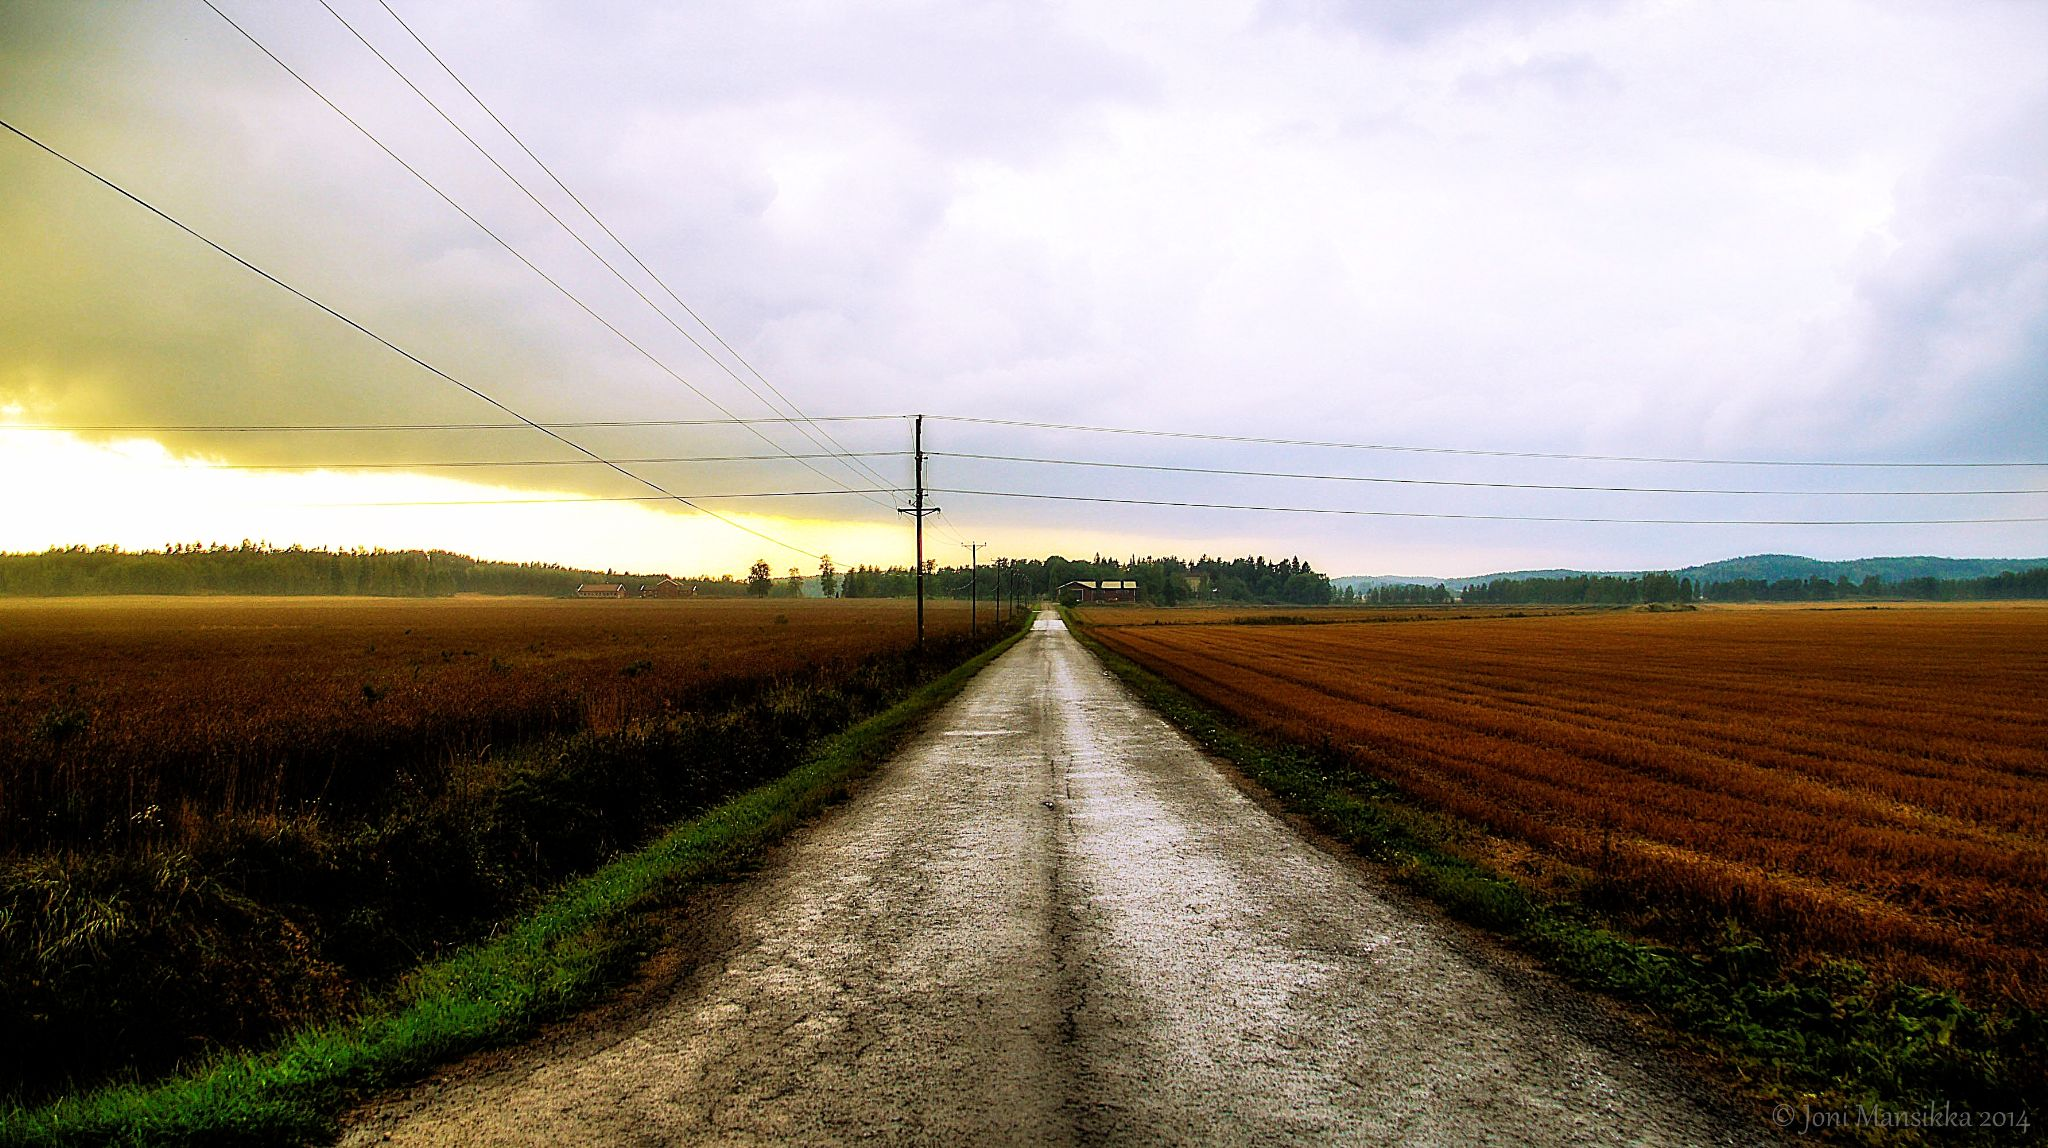 September fields of Paimio by Joni Mansikka